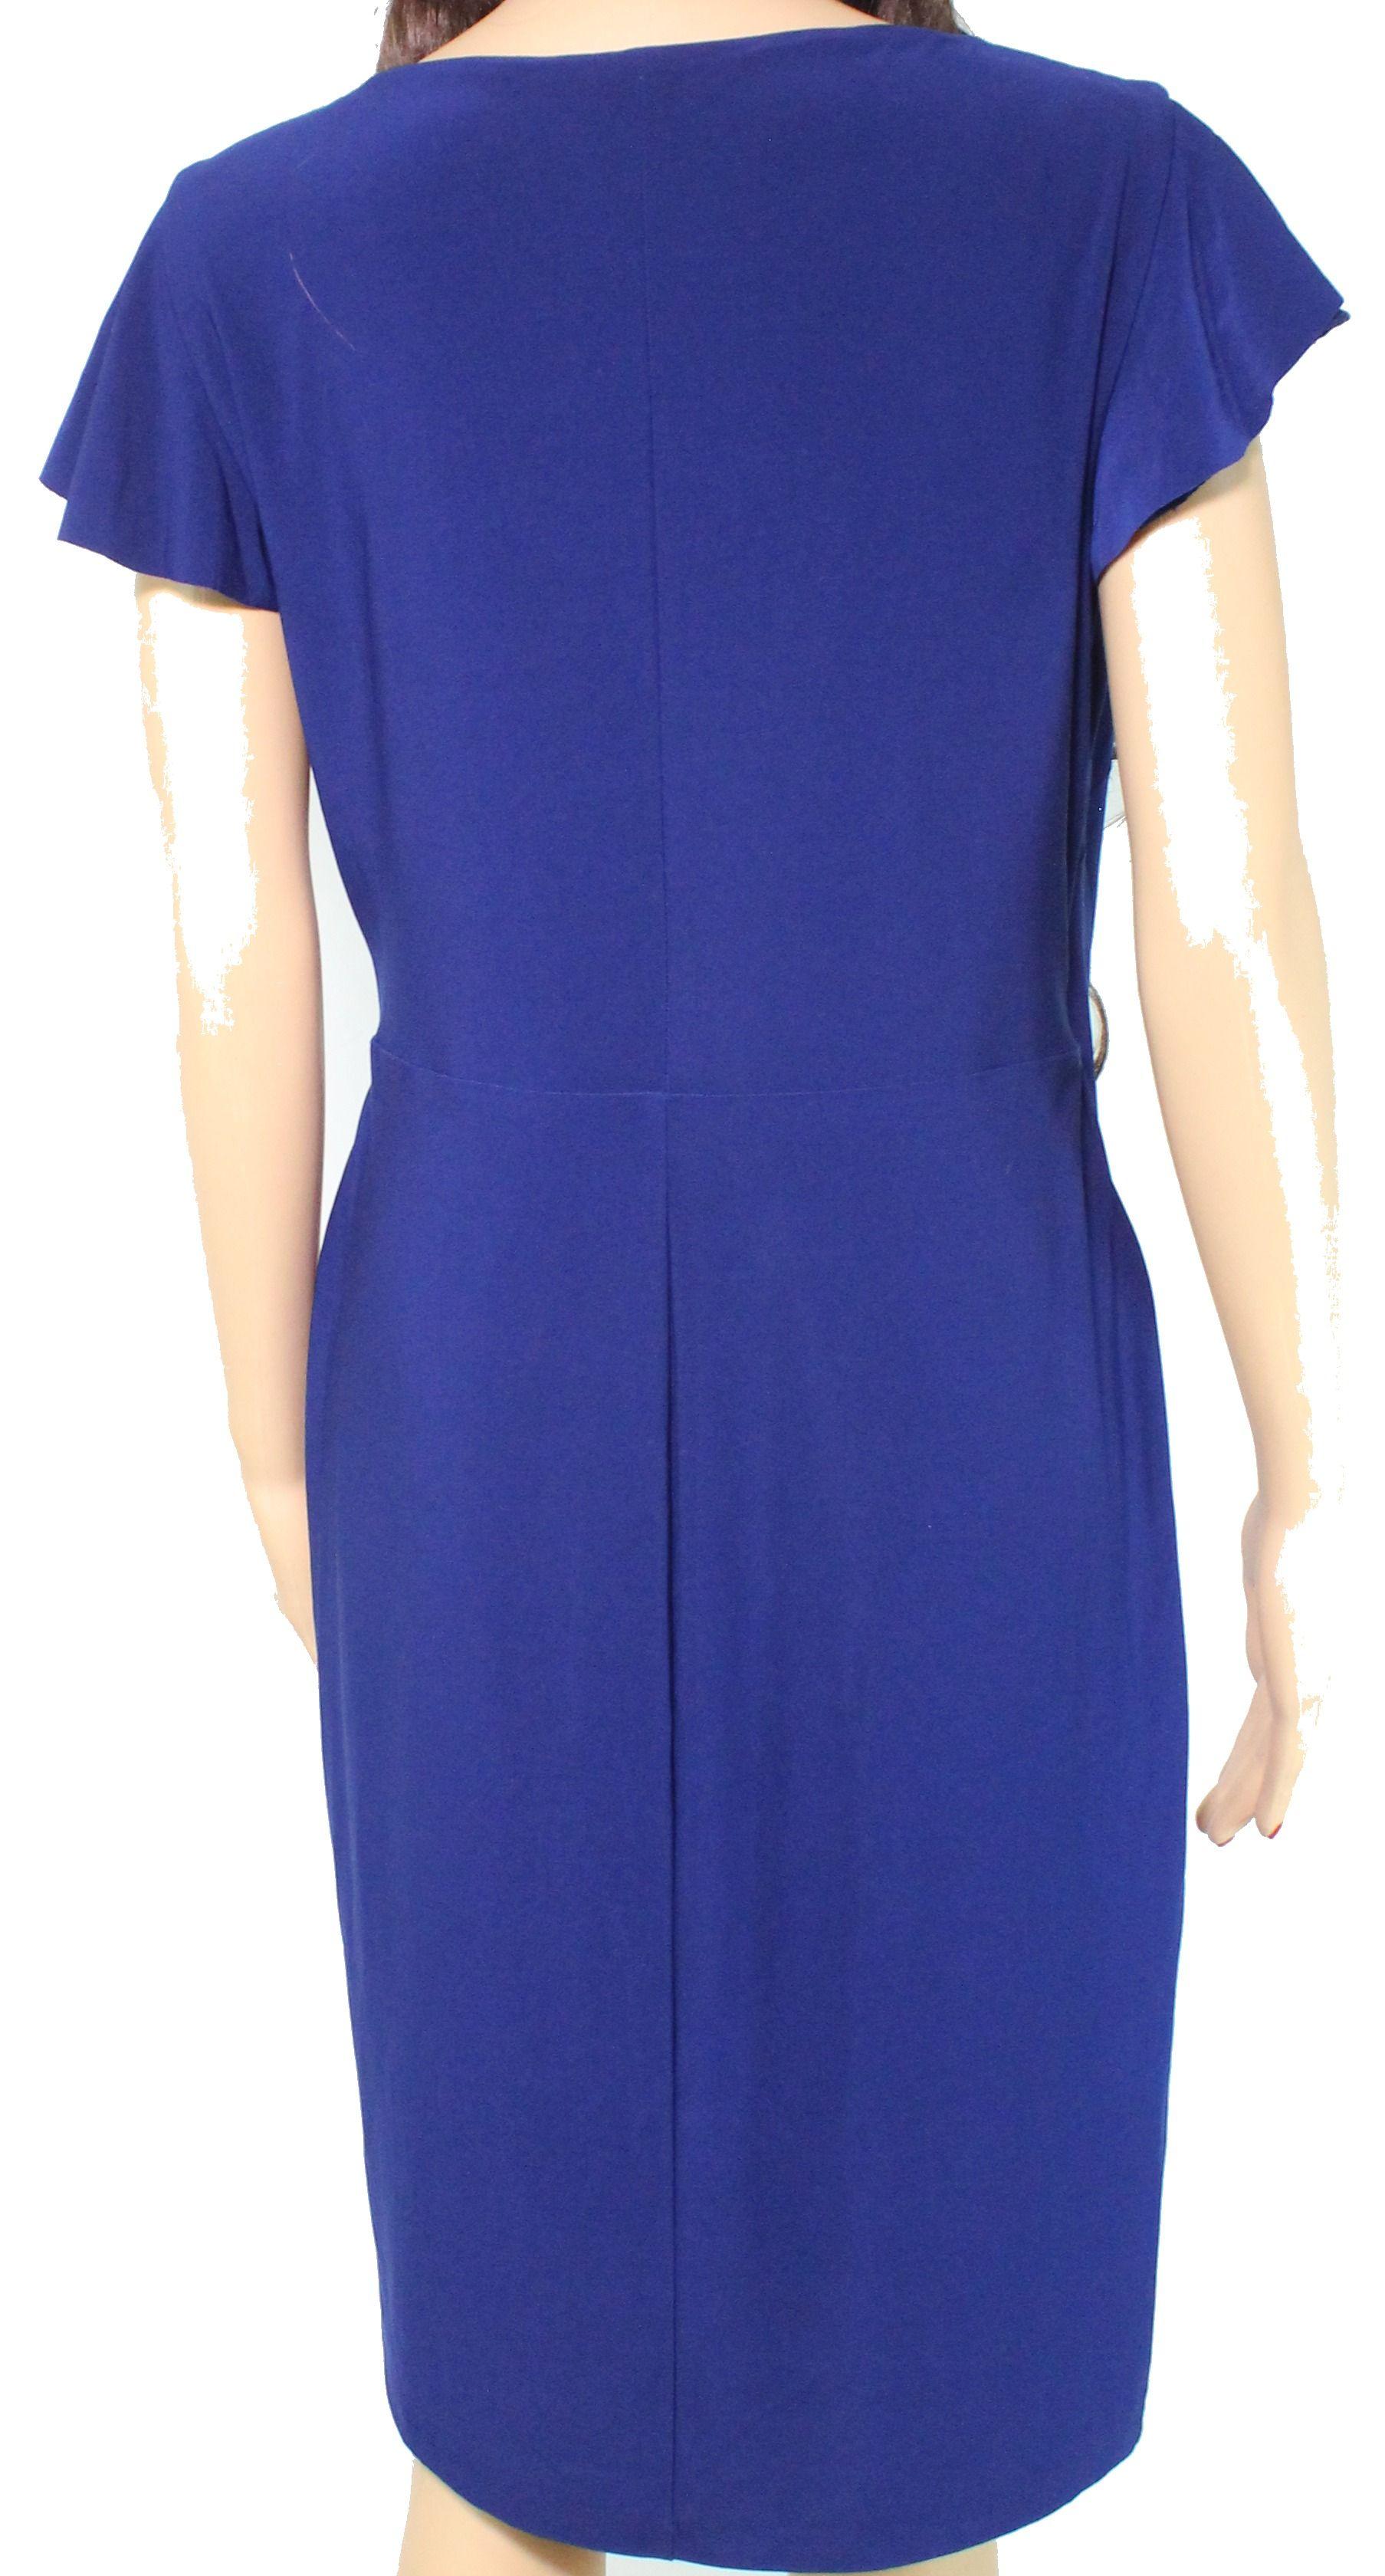 Lauren by Ralph Lauren Women's Dress Blue Size 10 Sheath Ruffle Front